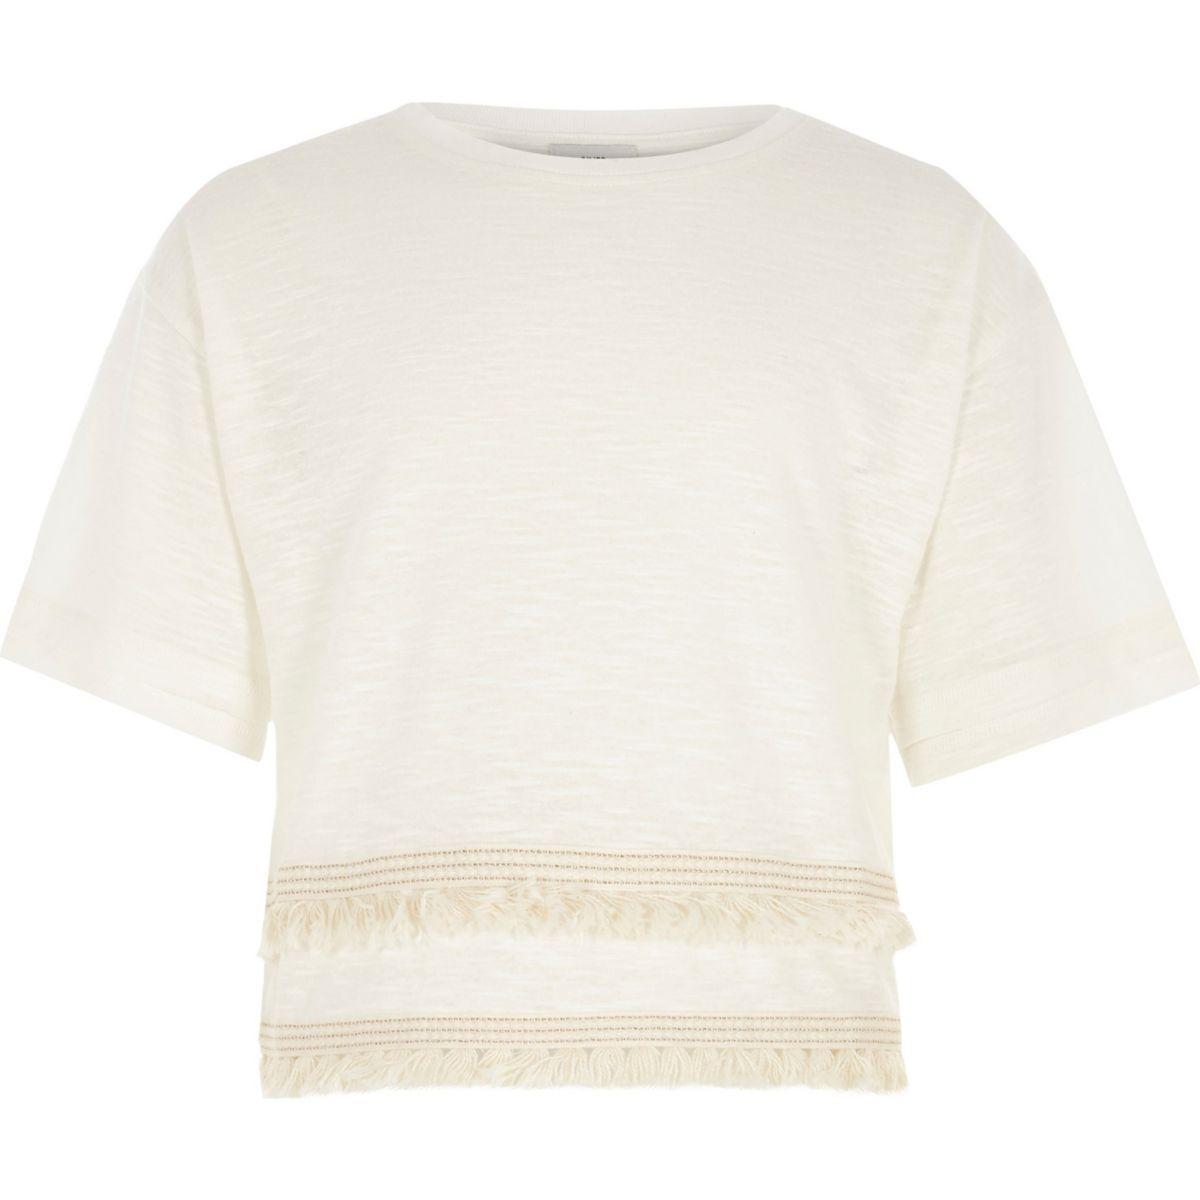 Girls cream slub fringe tape T-shirt